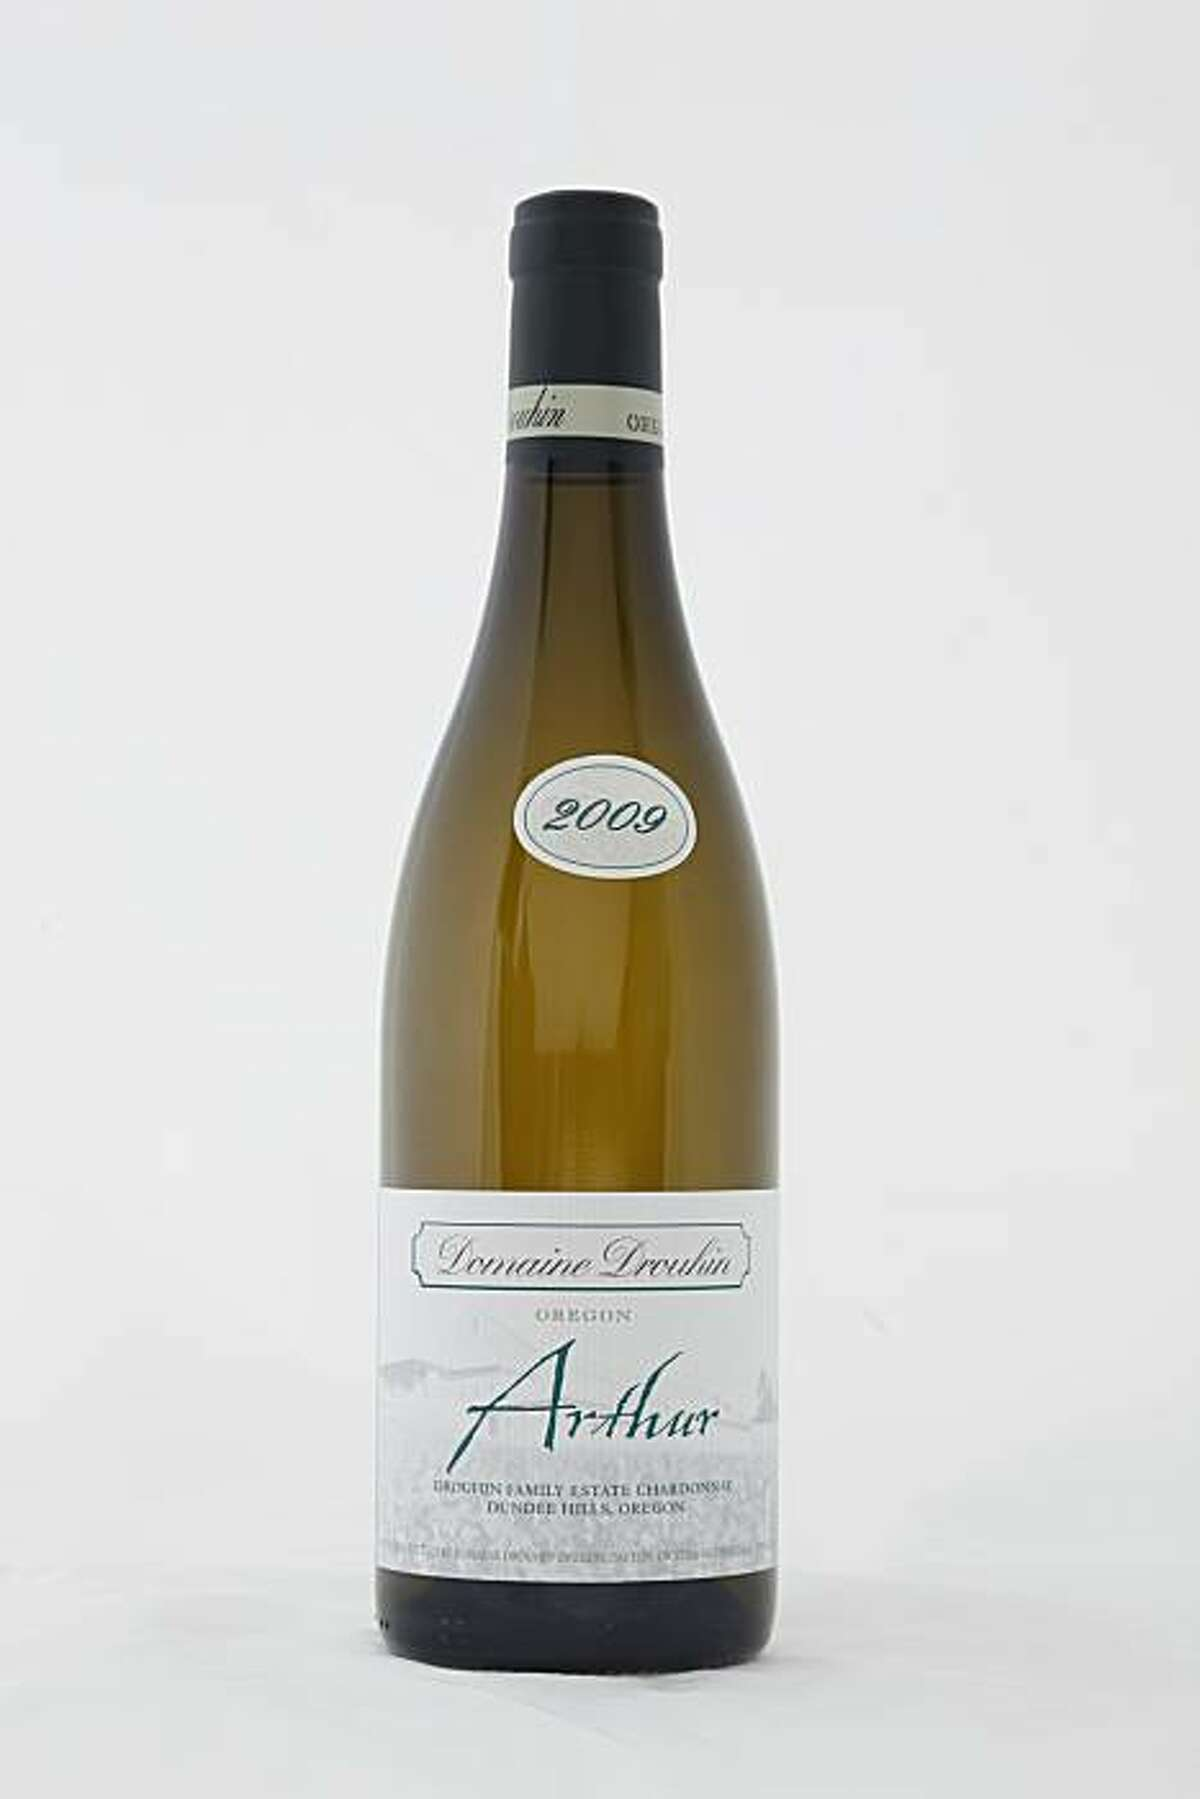 2009 Domaine Drouhin Oregon Arthur Dundee Hills Chardonnay ($30) as seen in San Francisco, Calif., on February 16, 2011.